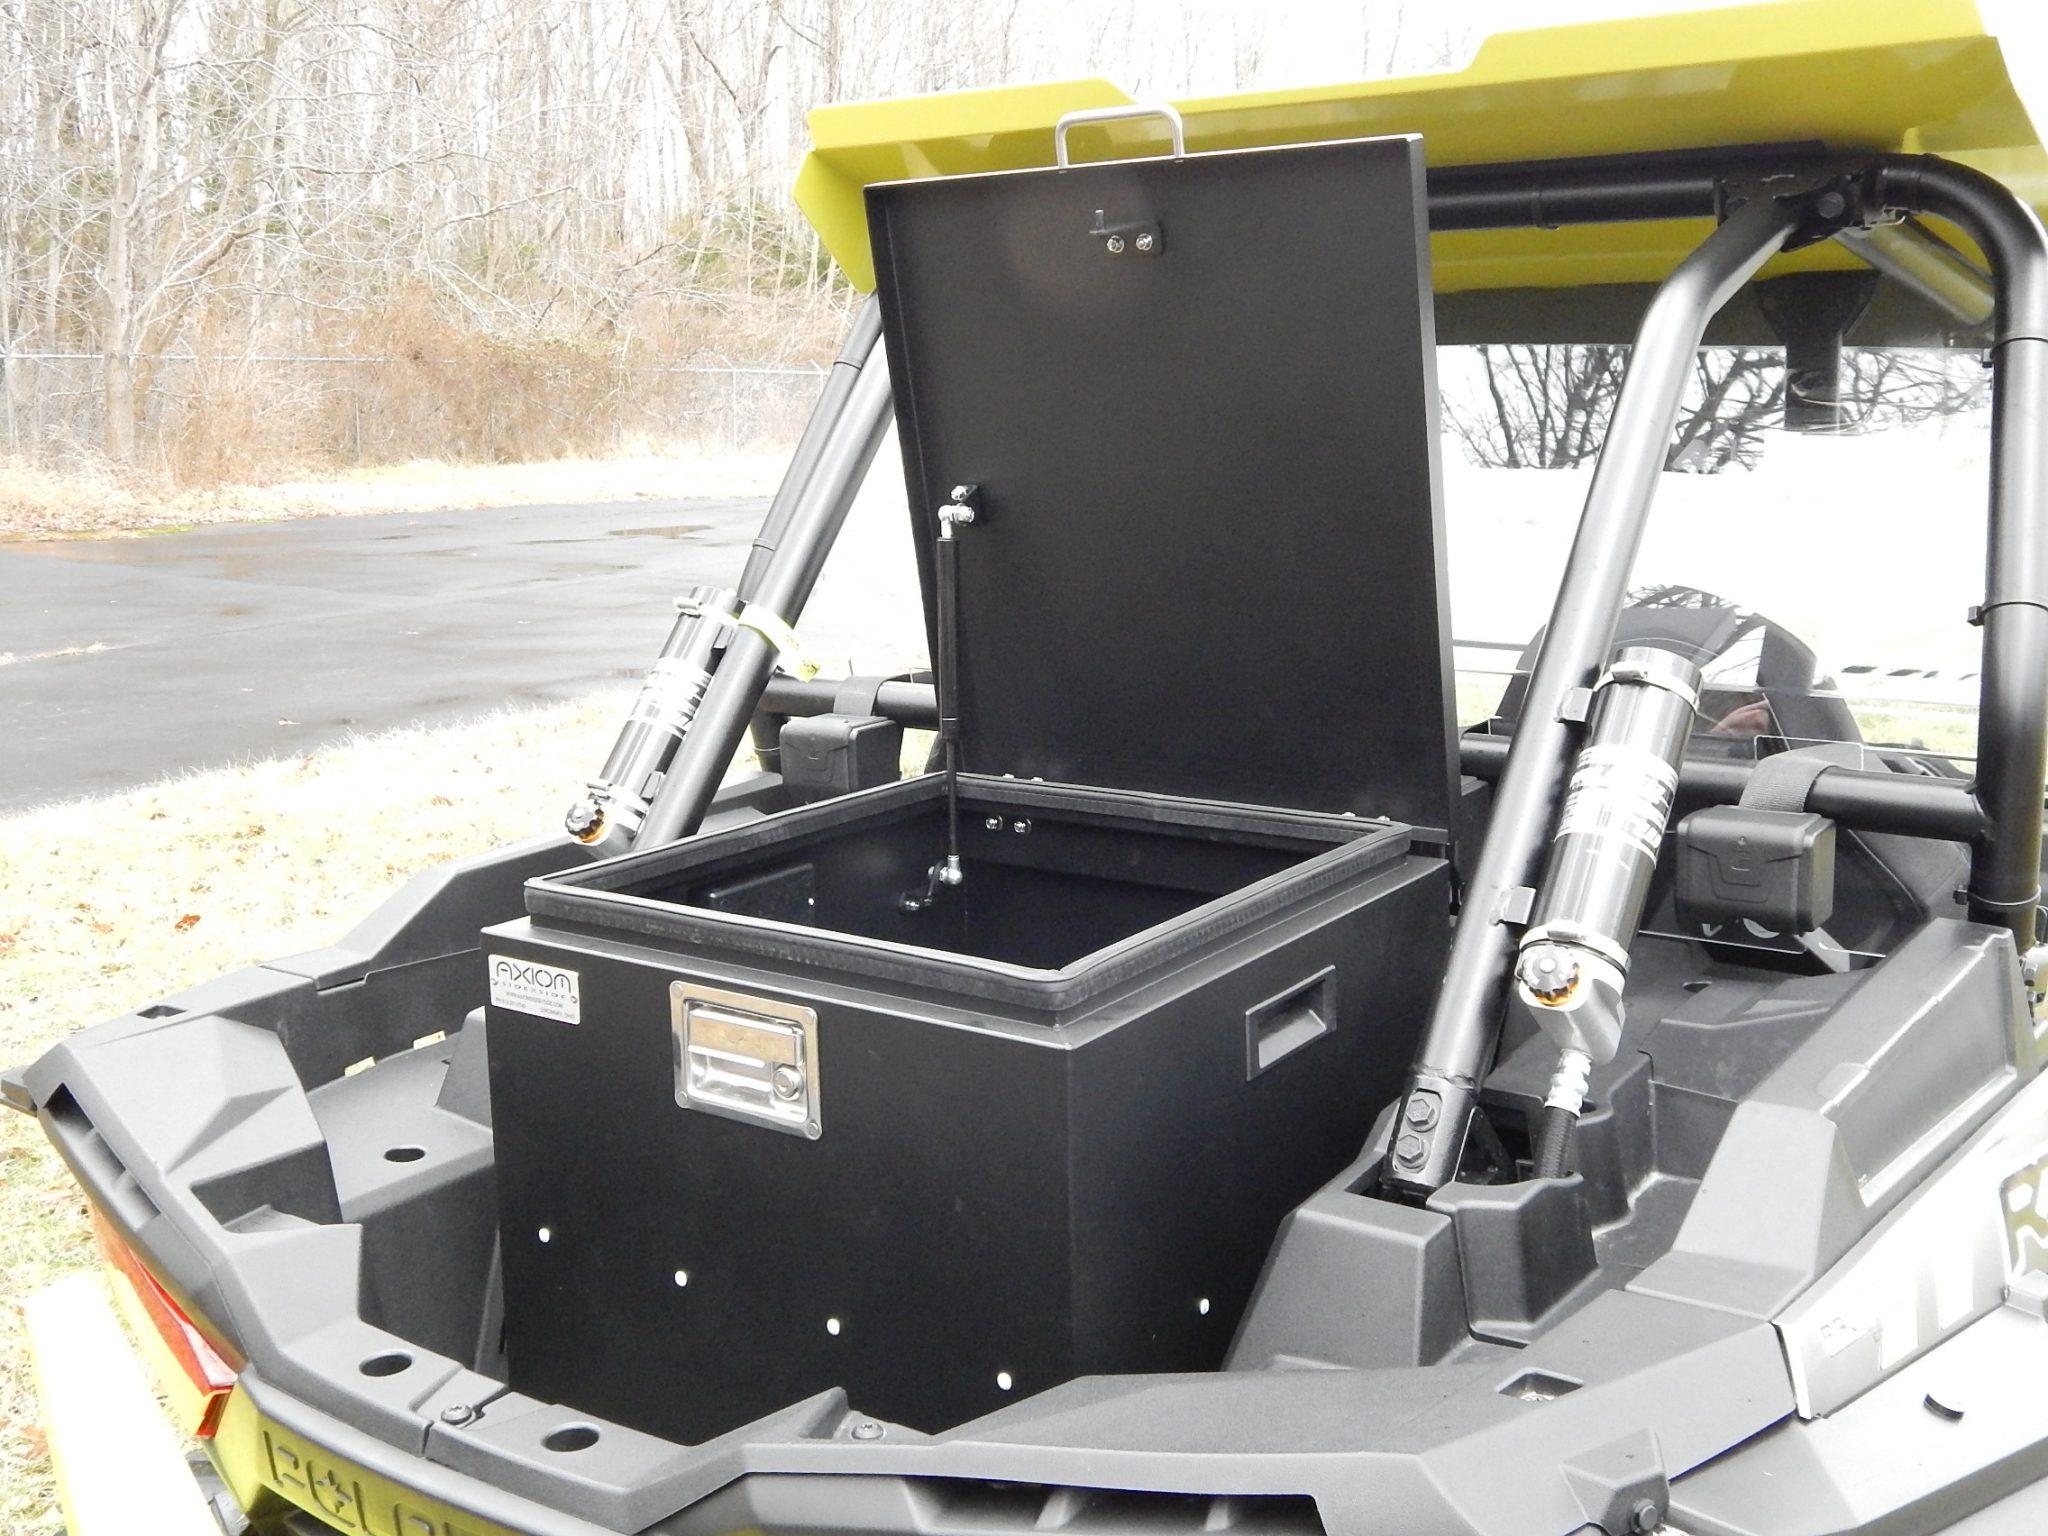 Axiom Cargo Box Polaris Rzr Xp Turbo Axiom Side By Side